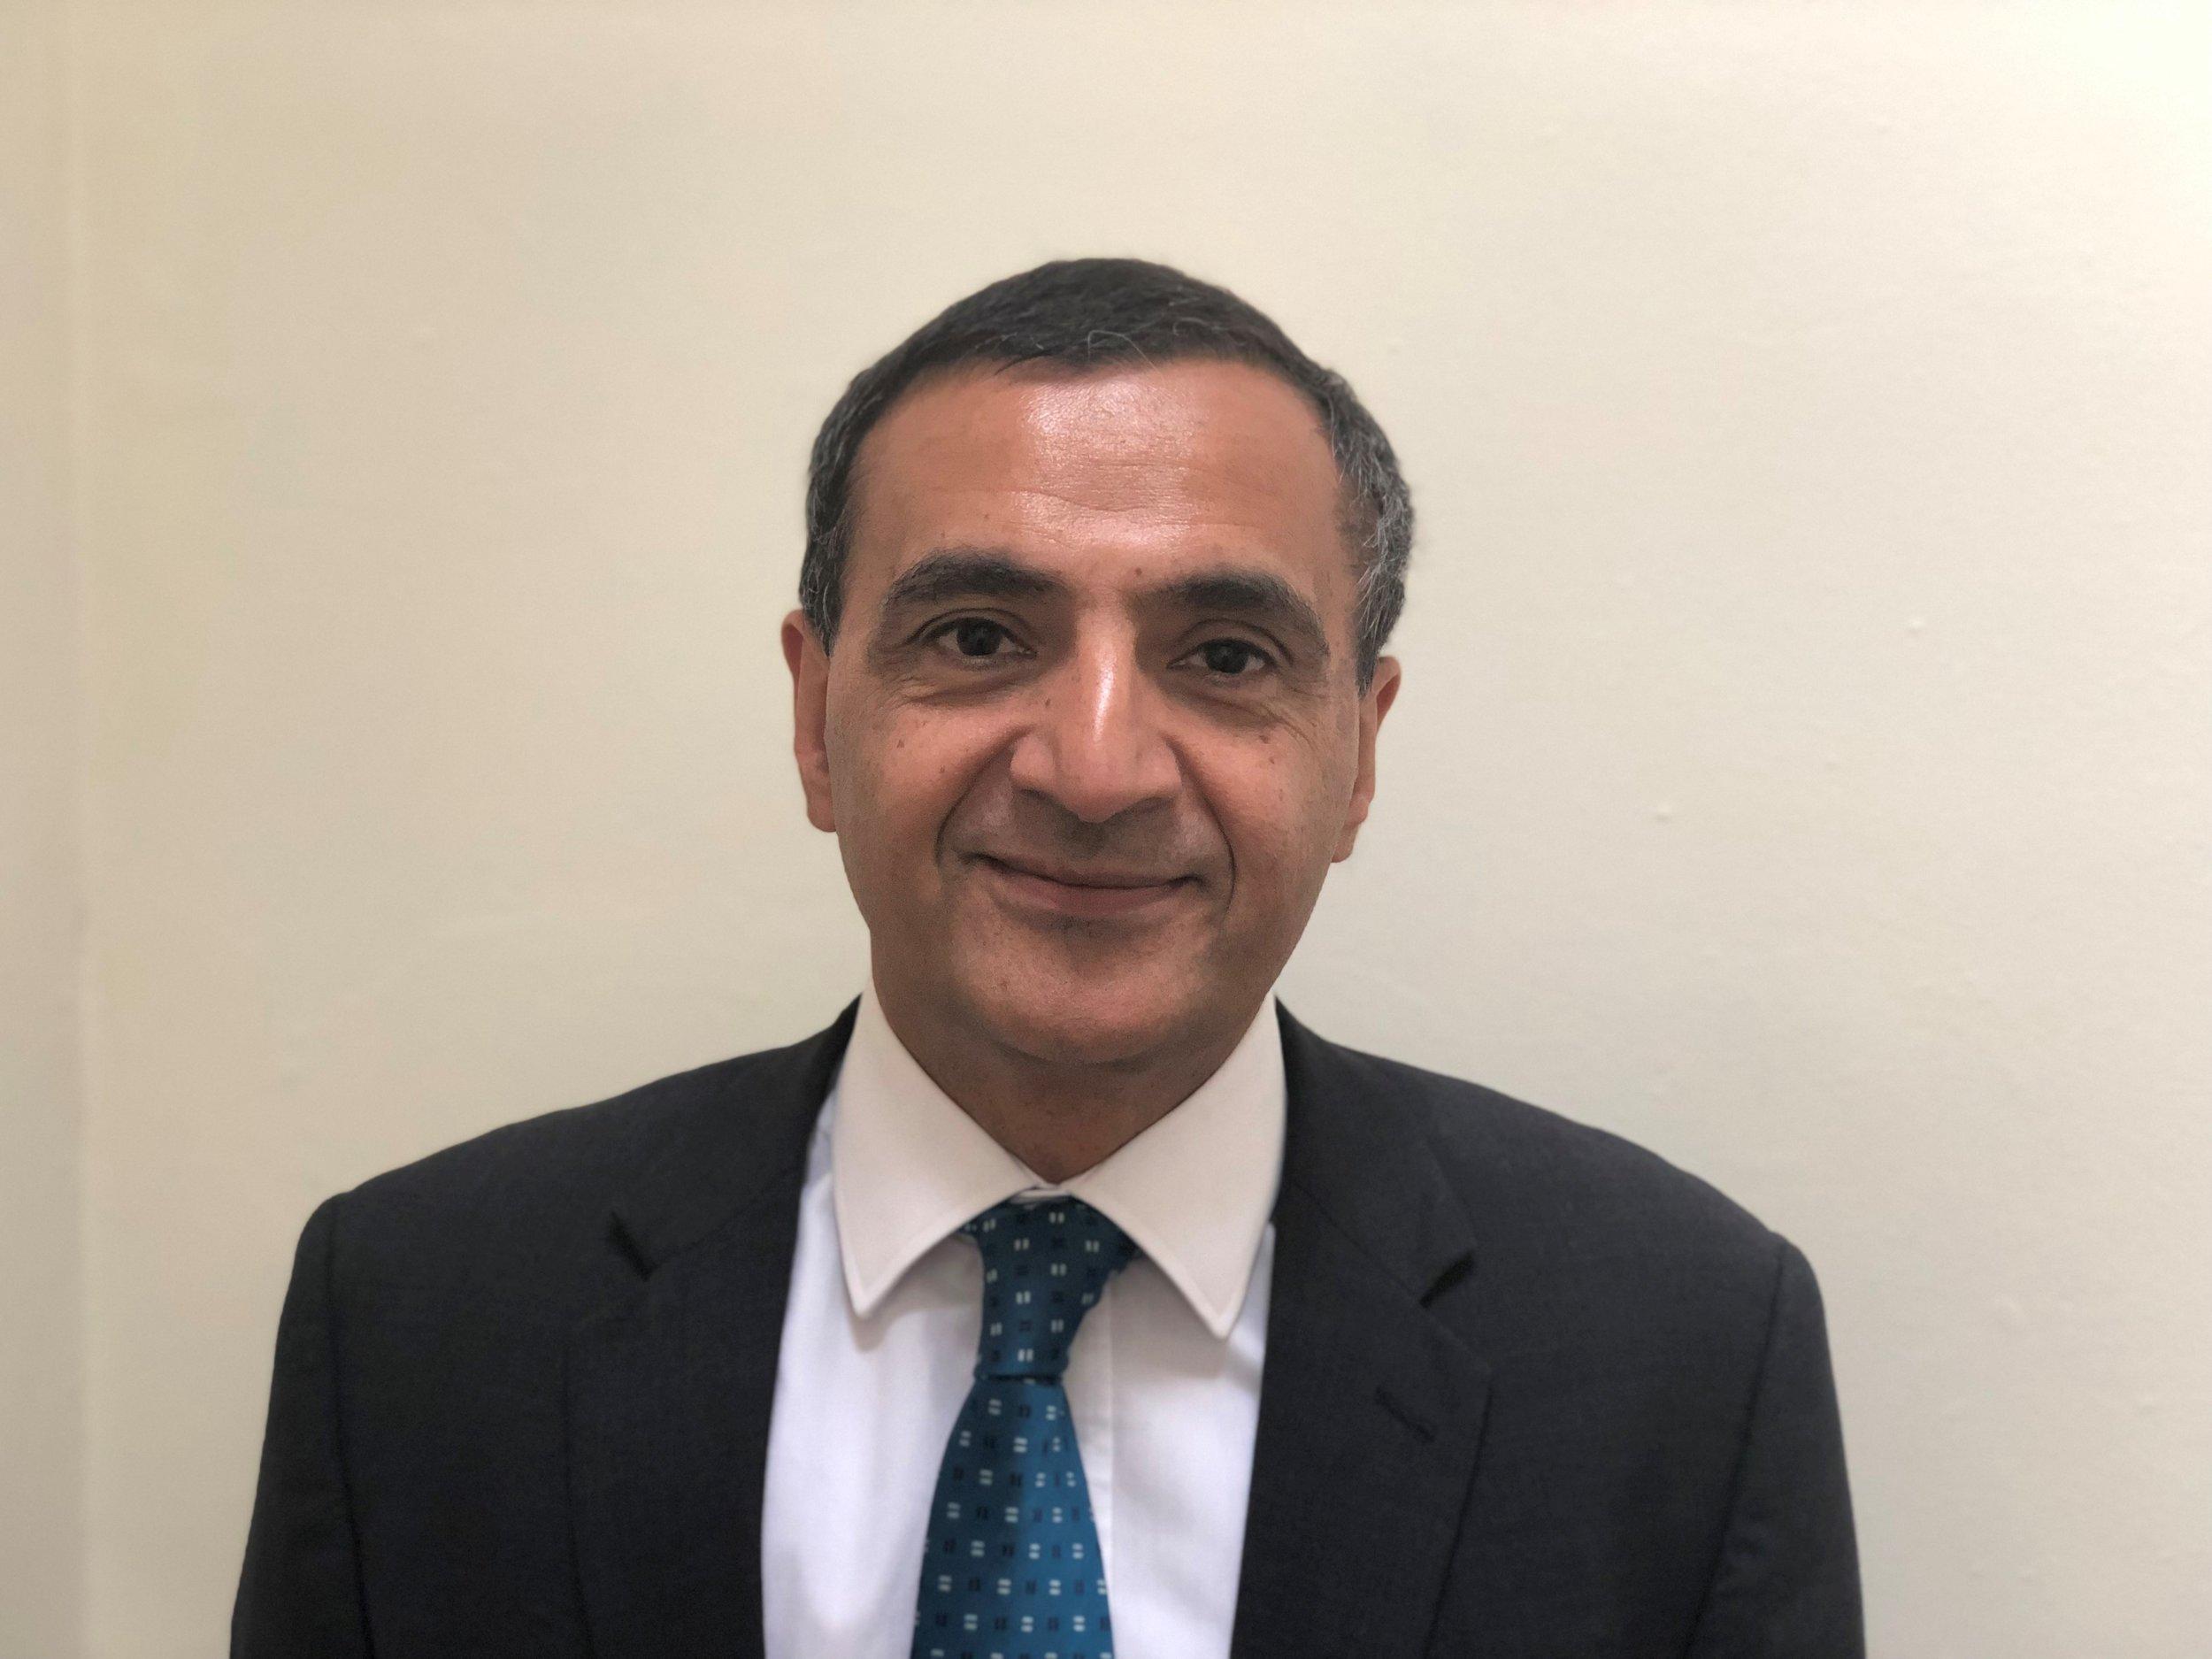 Mr Shakeel Akhtar - Dental Implant Surgeon